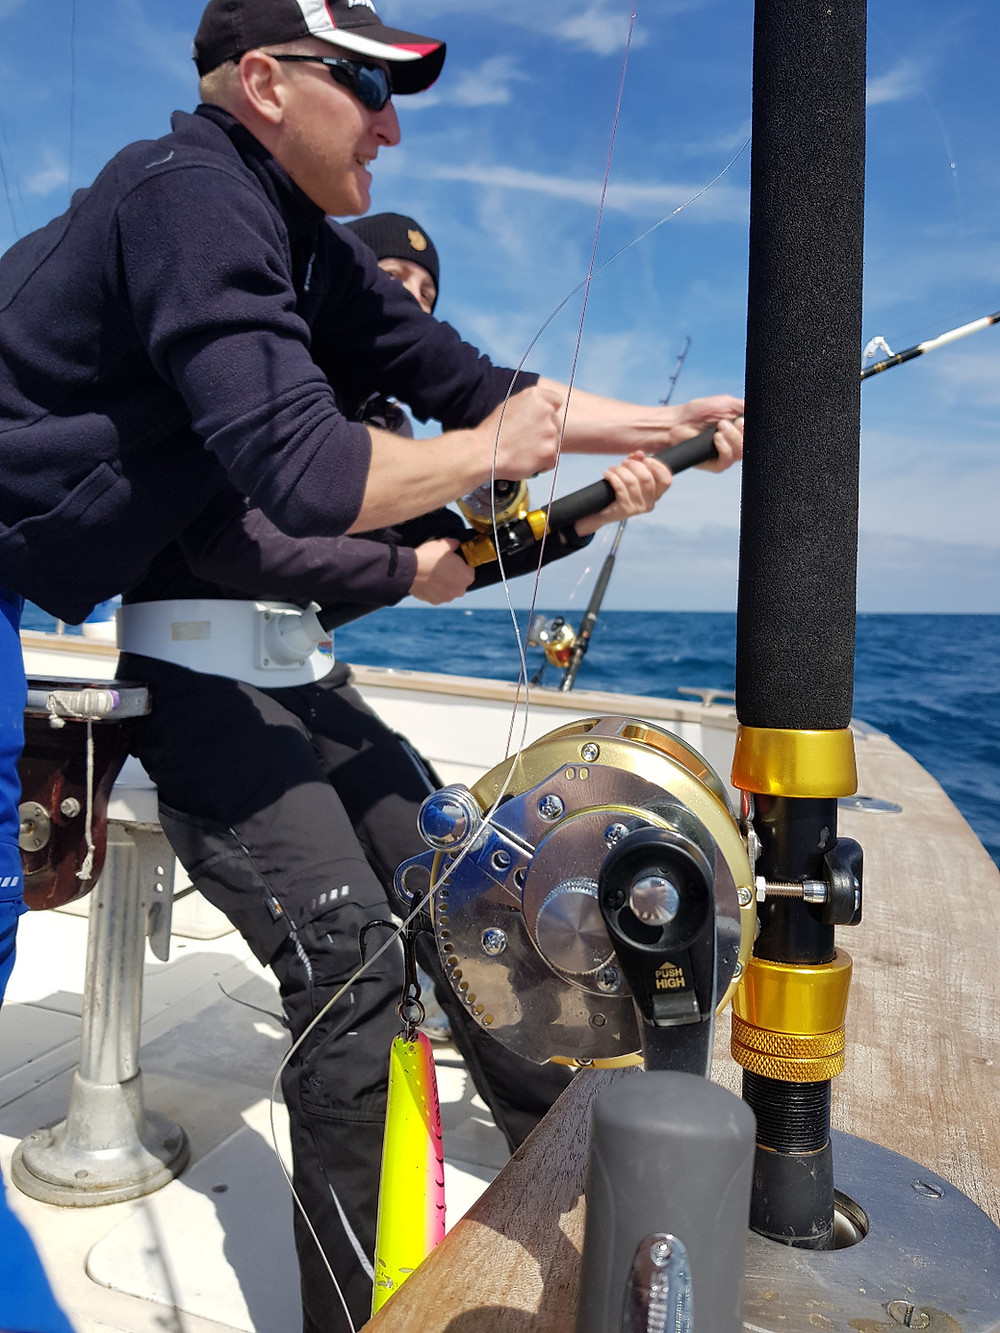 BIG GAME MALLORCA AND TROLLING FISHING MALLORCA